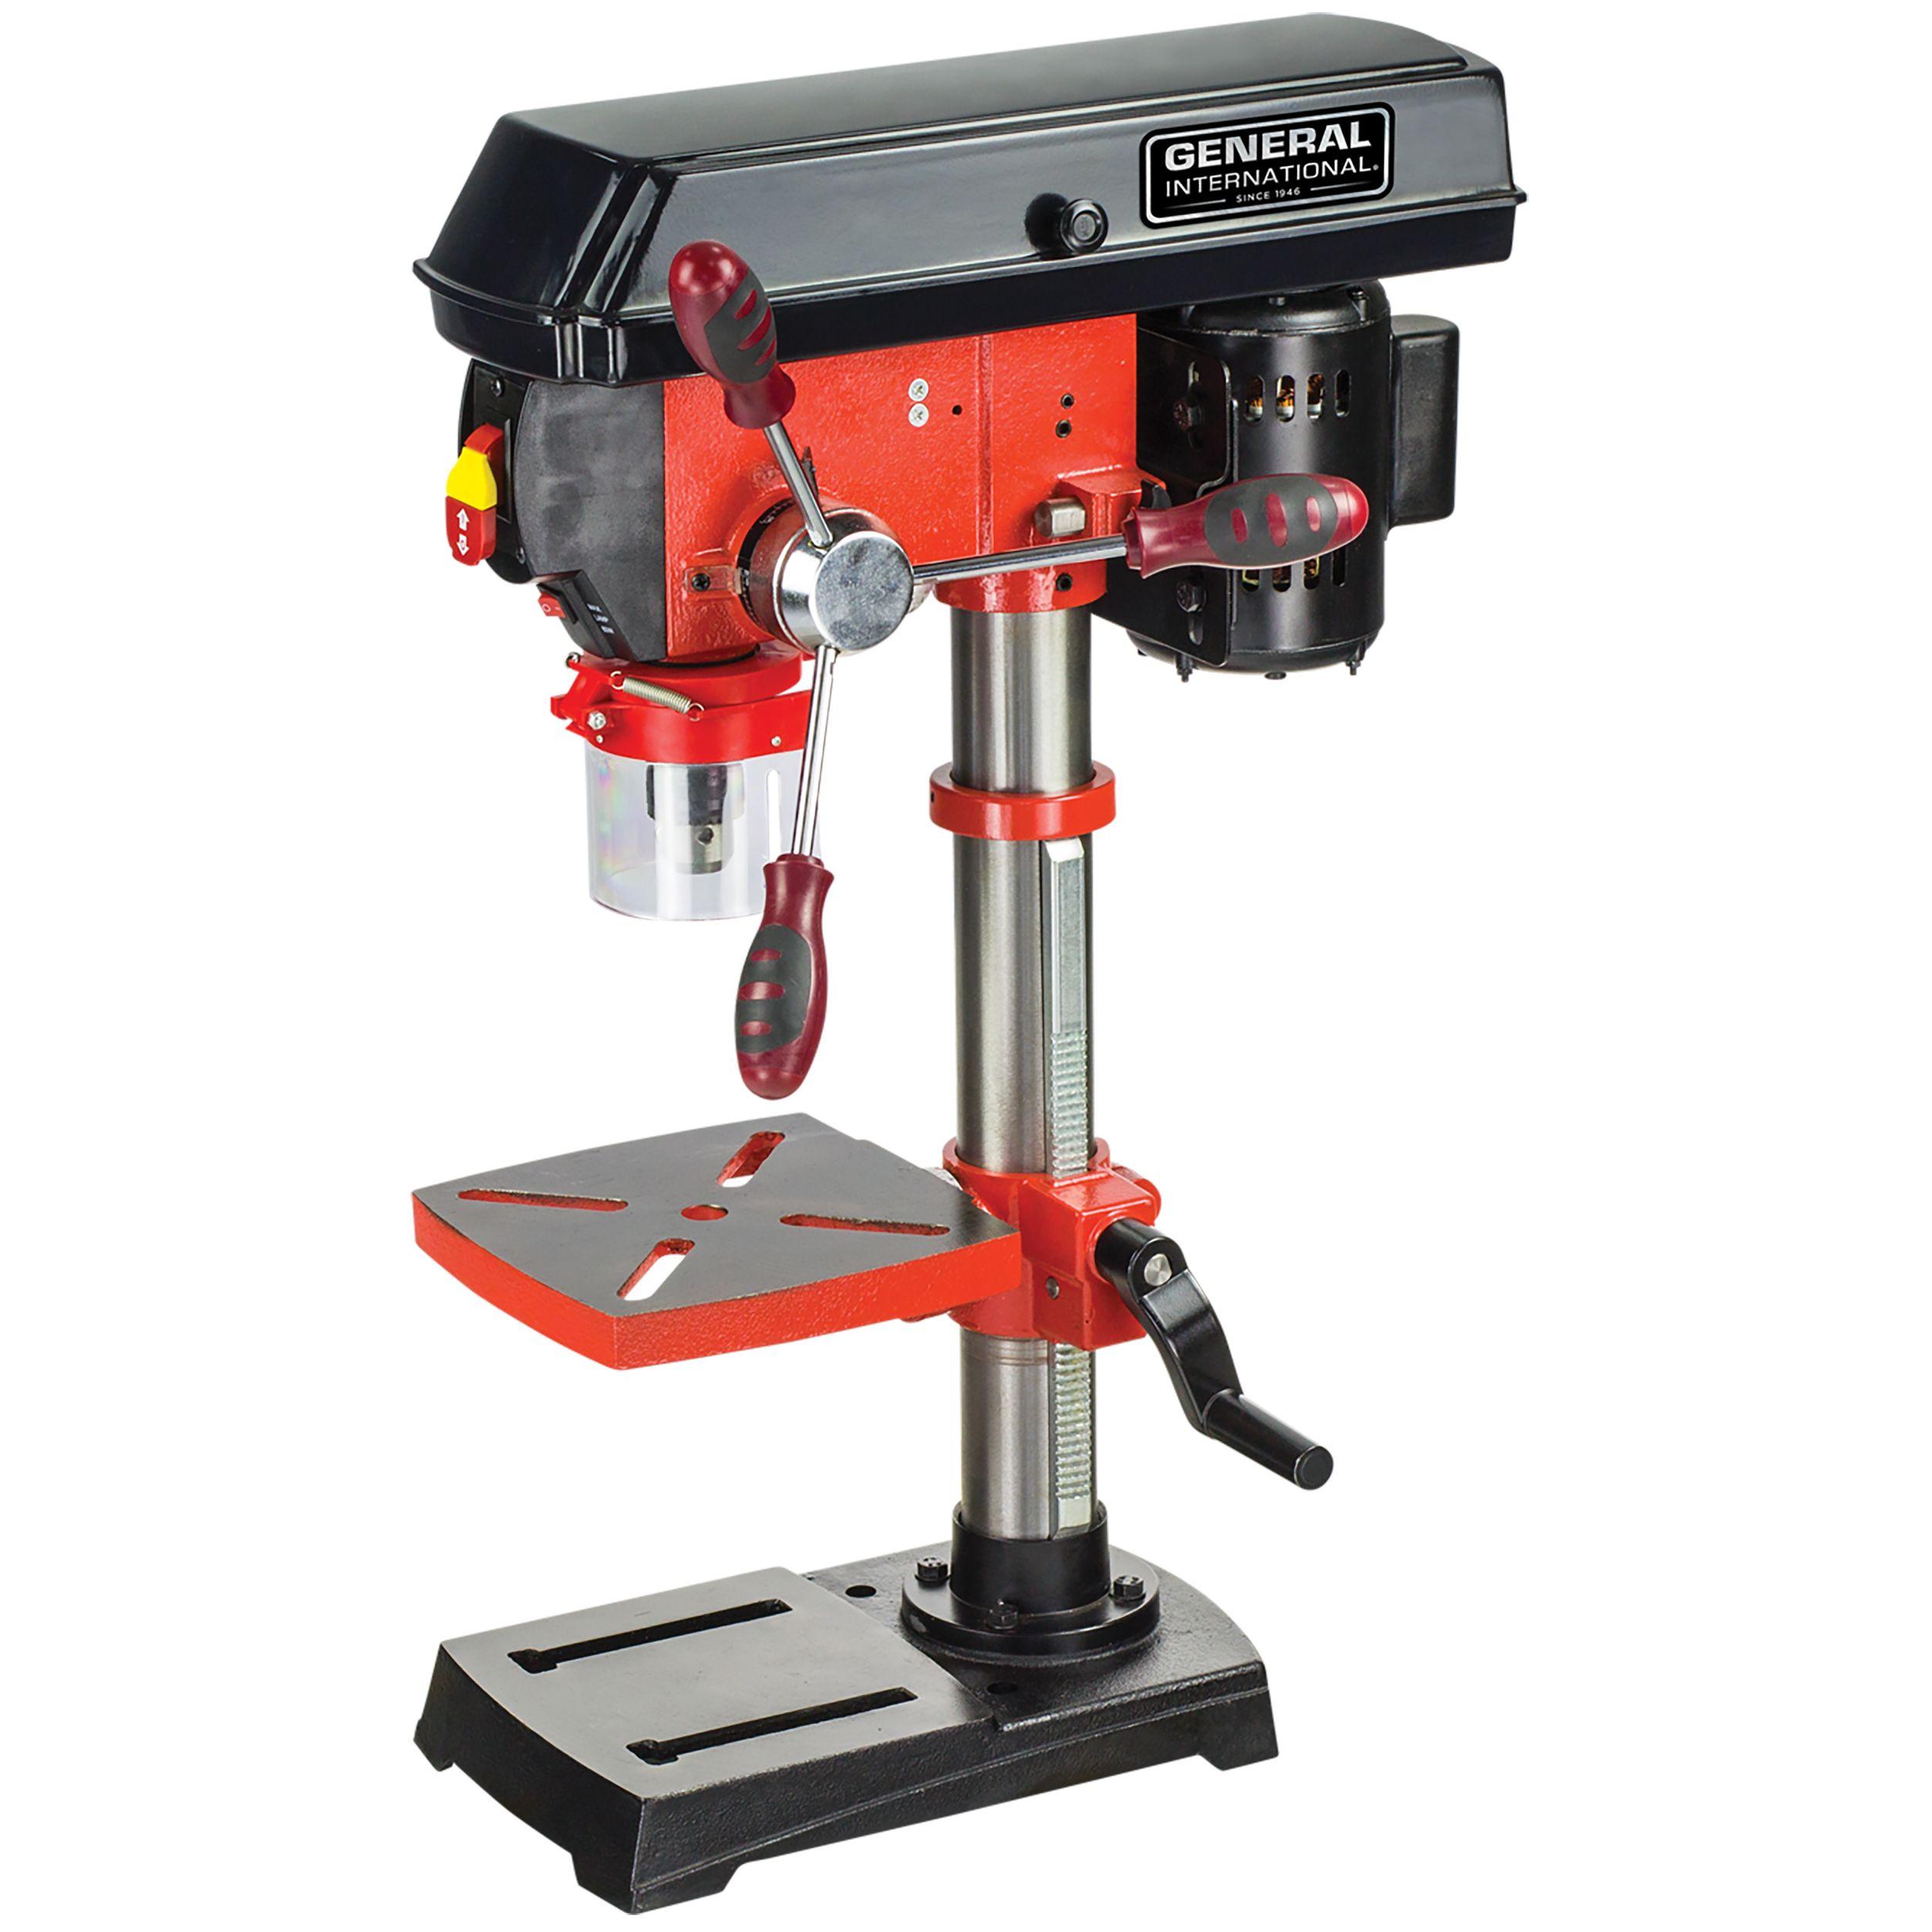 Enjoyable General International 10 Inch 5 Speed Drill Press With Ibusinesslaw Wood Chair Design Ideas Ibusinesslaworg